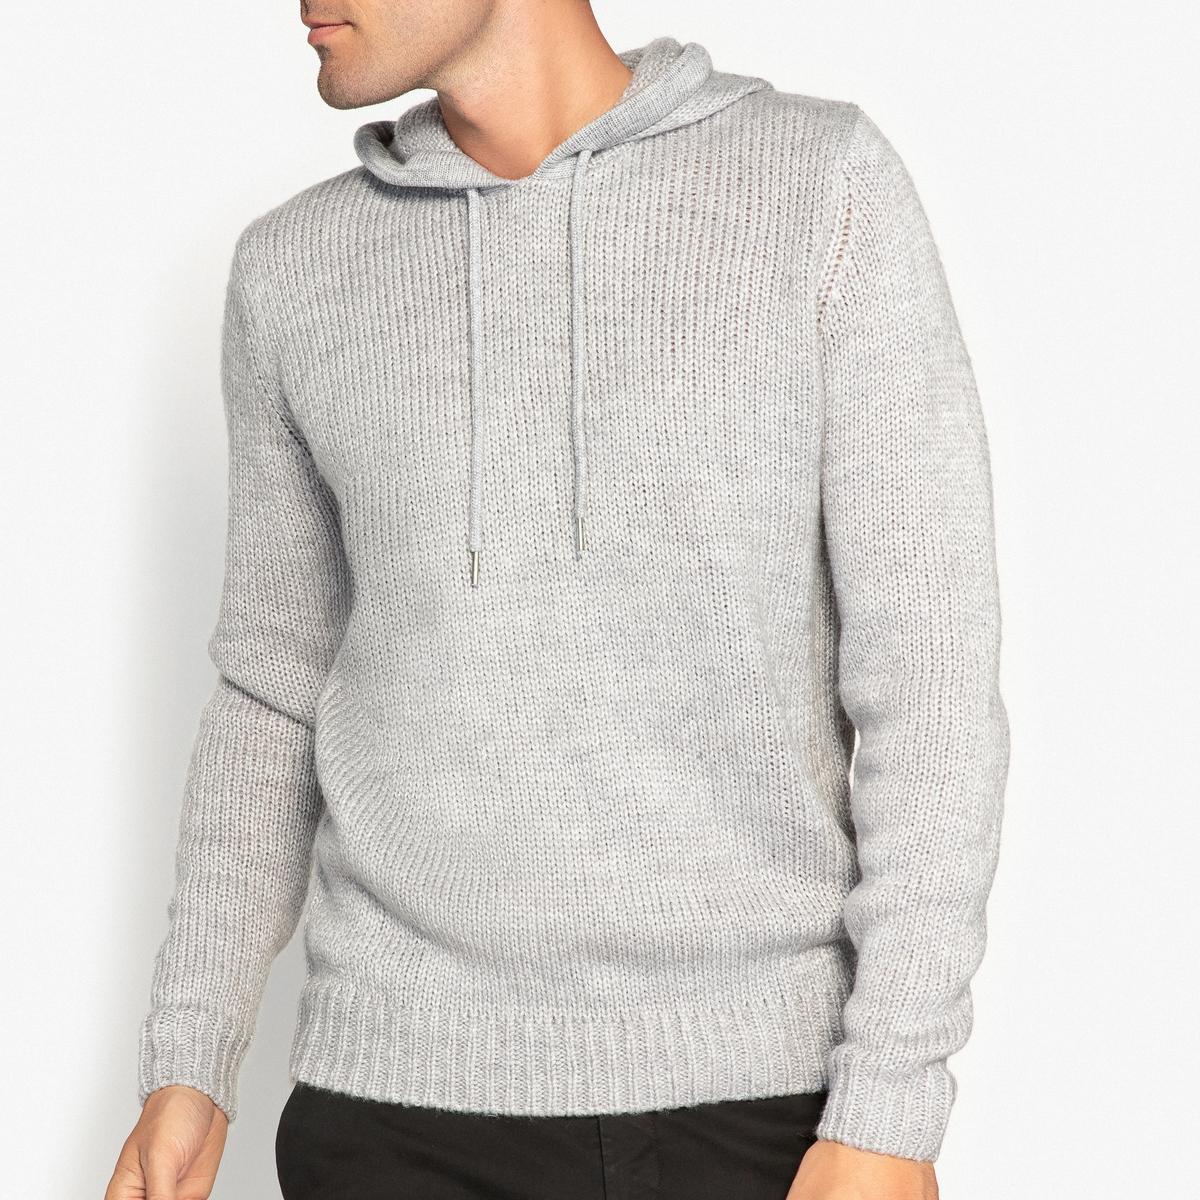 Пуловер с капюшоном, из плотного трикотажа